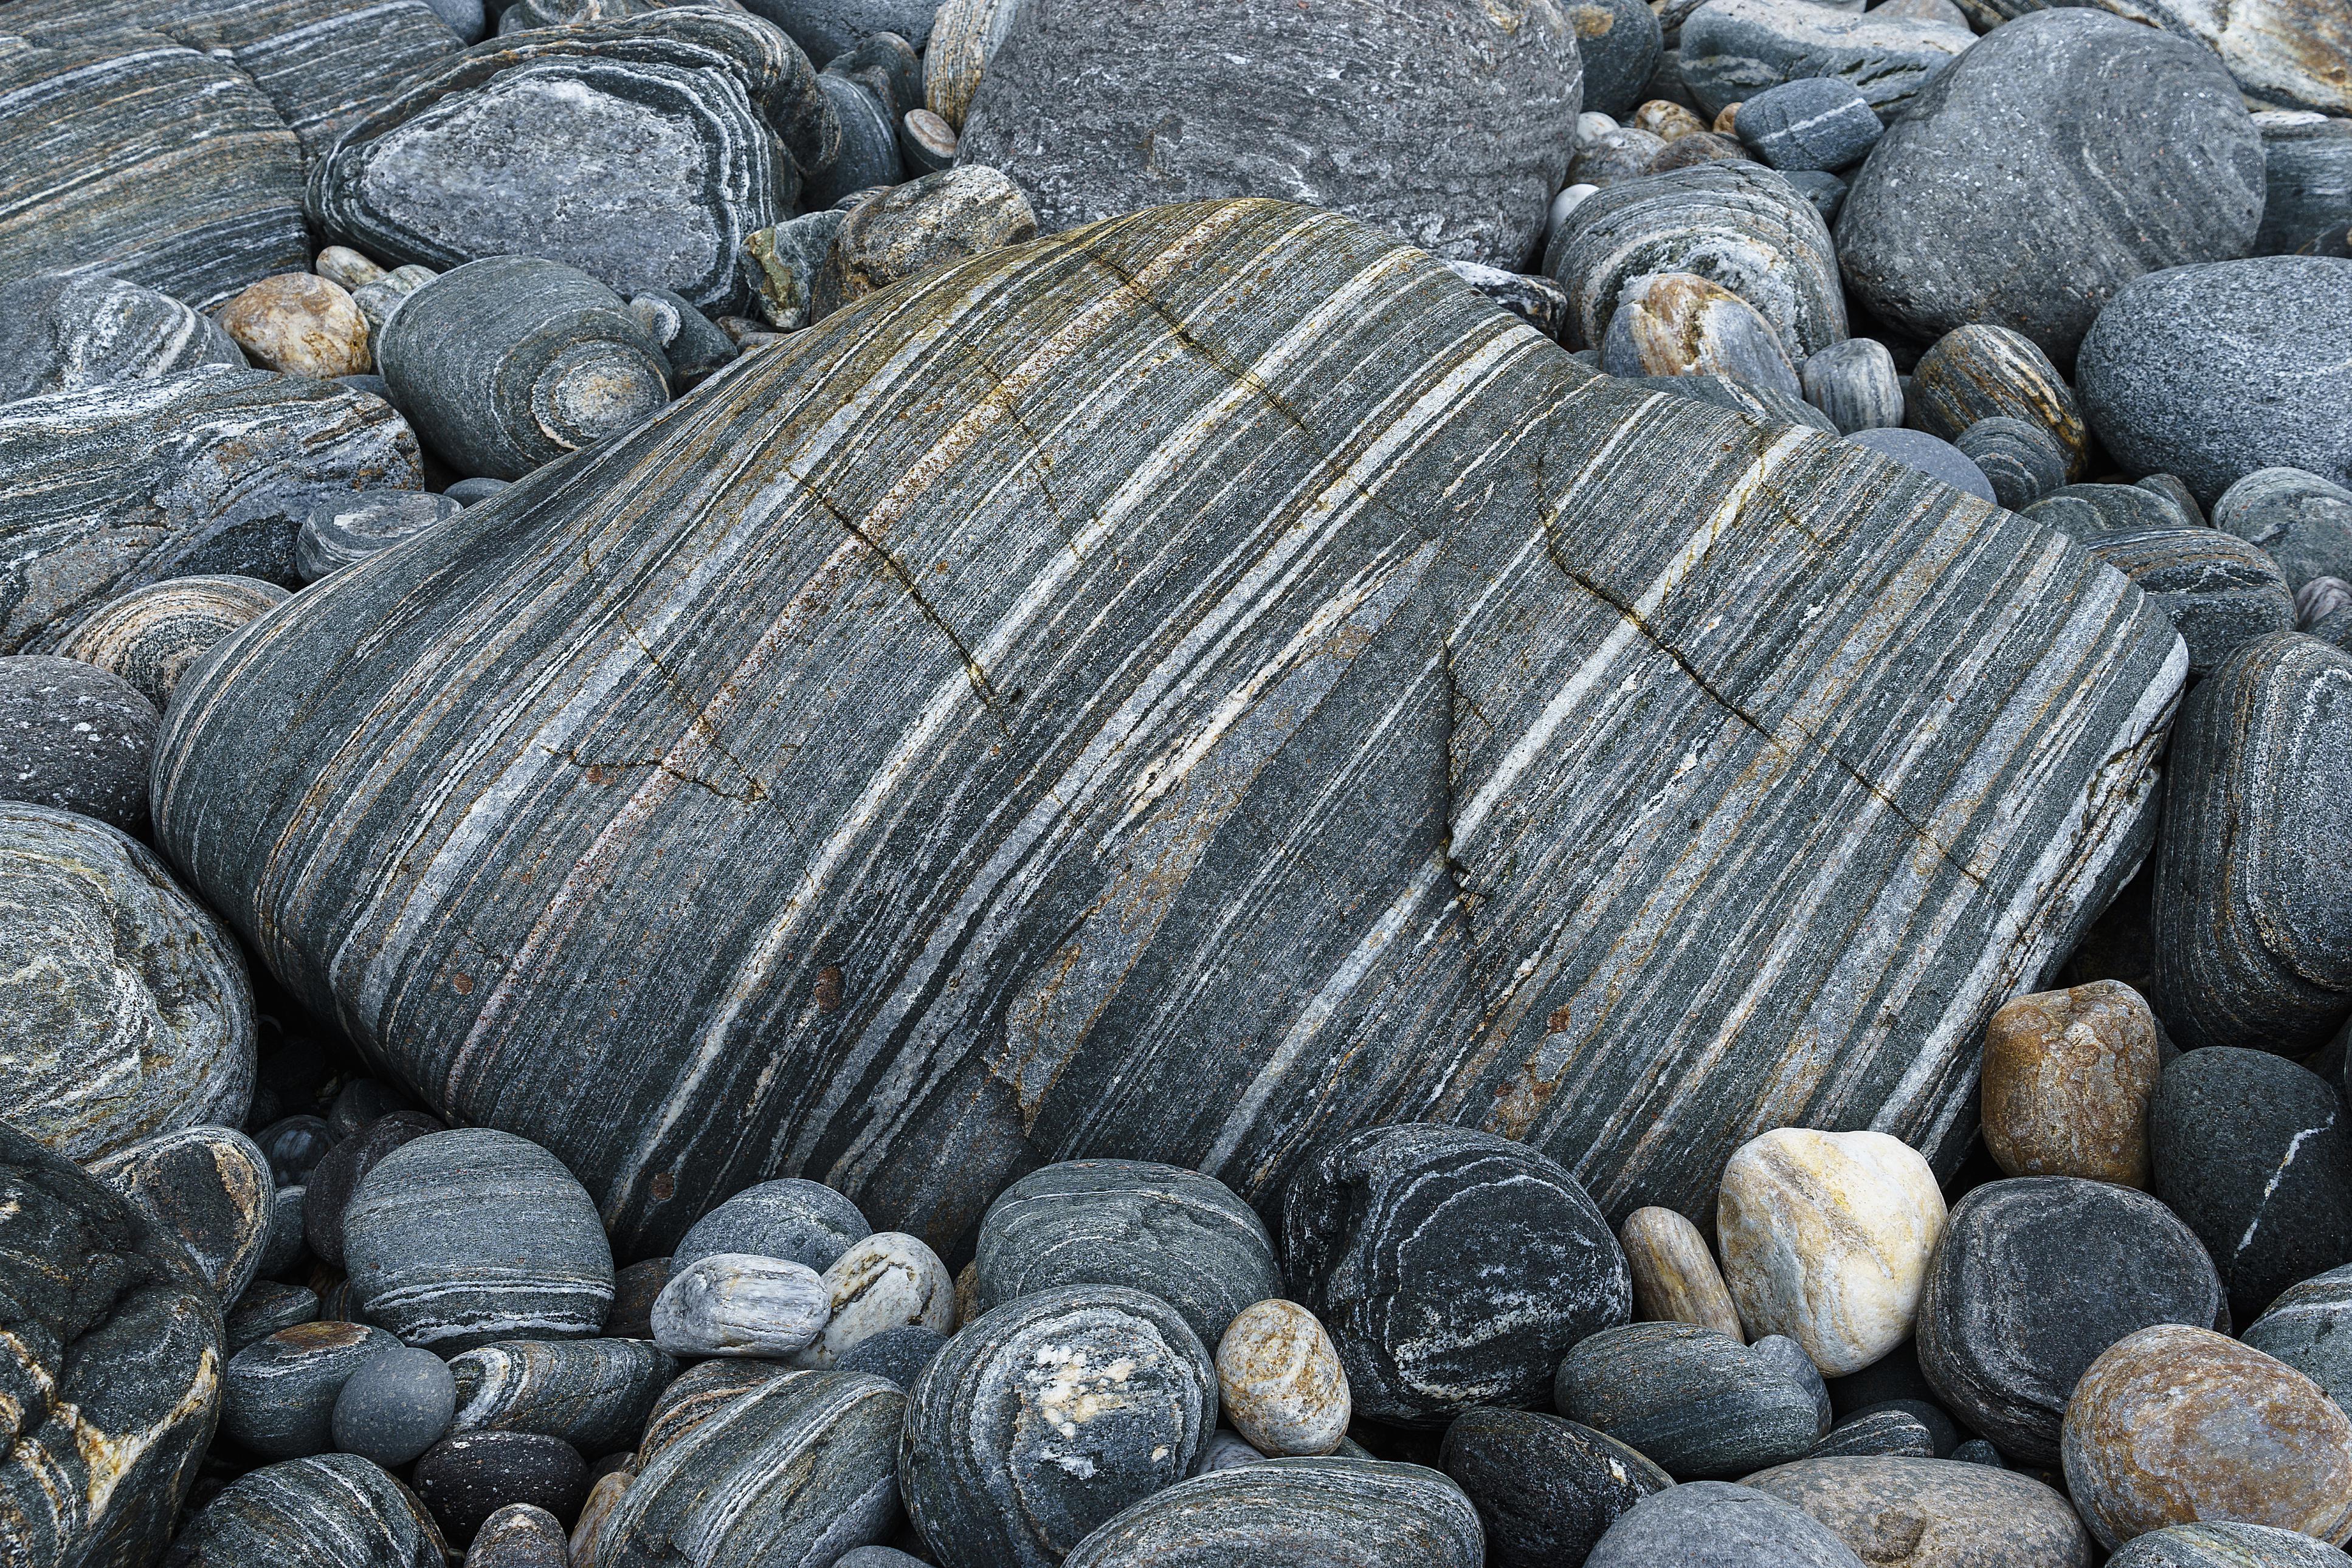 What Makes Metamorphic Rocks So Unique?